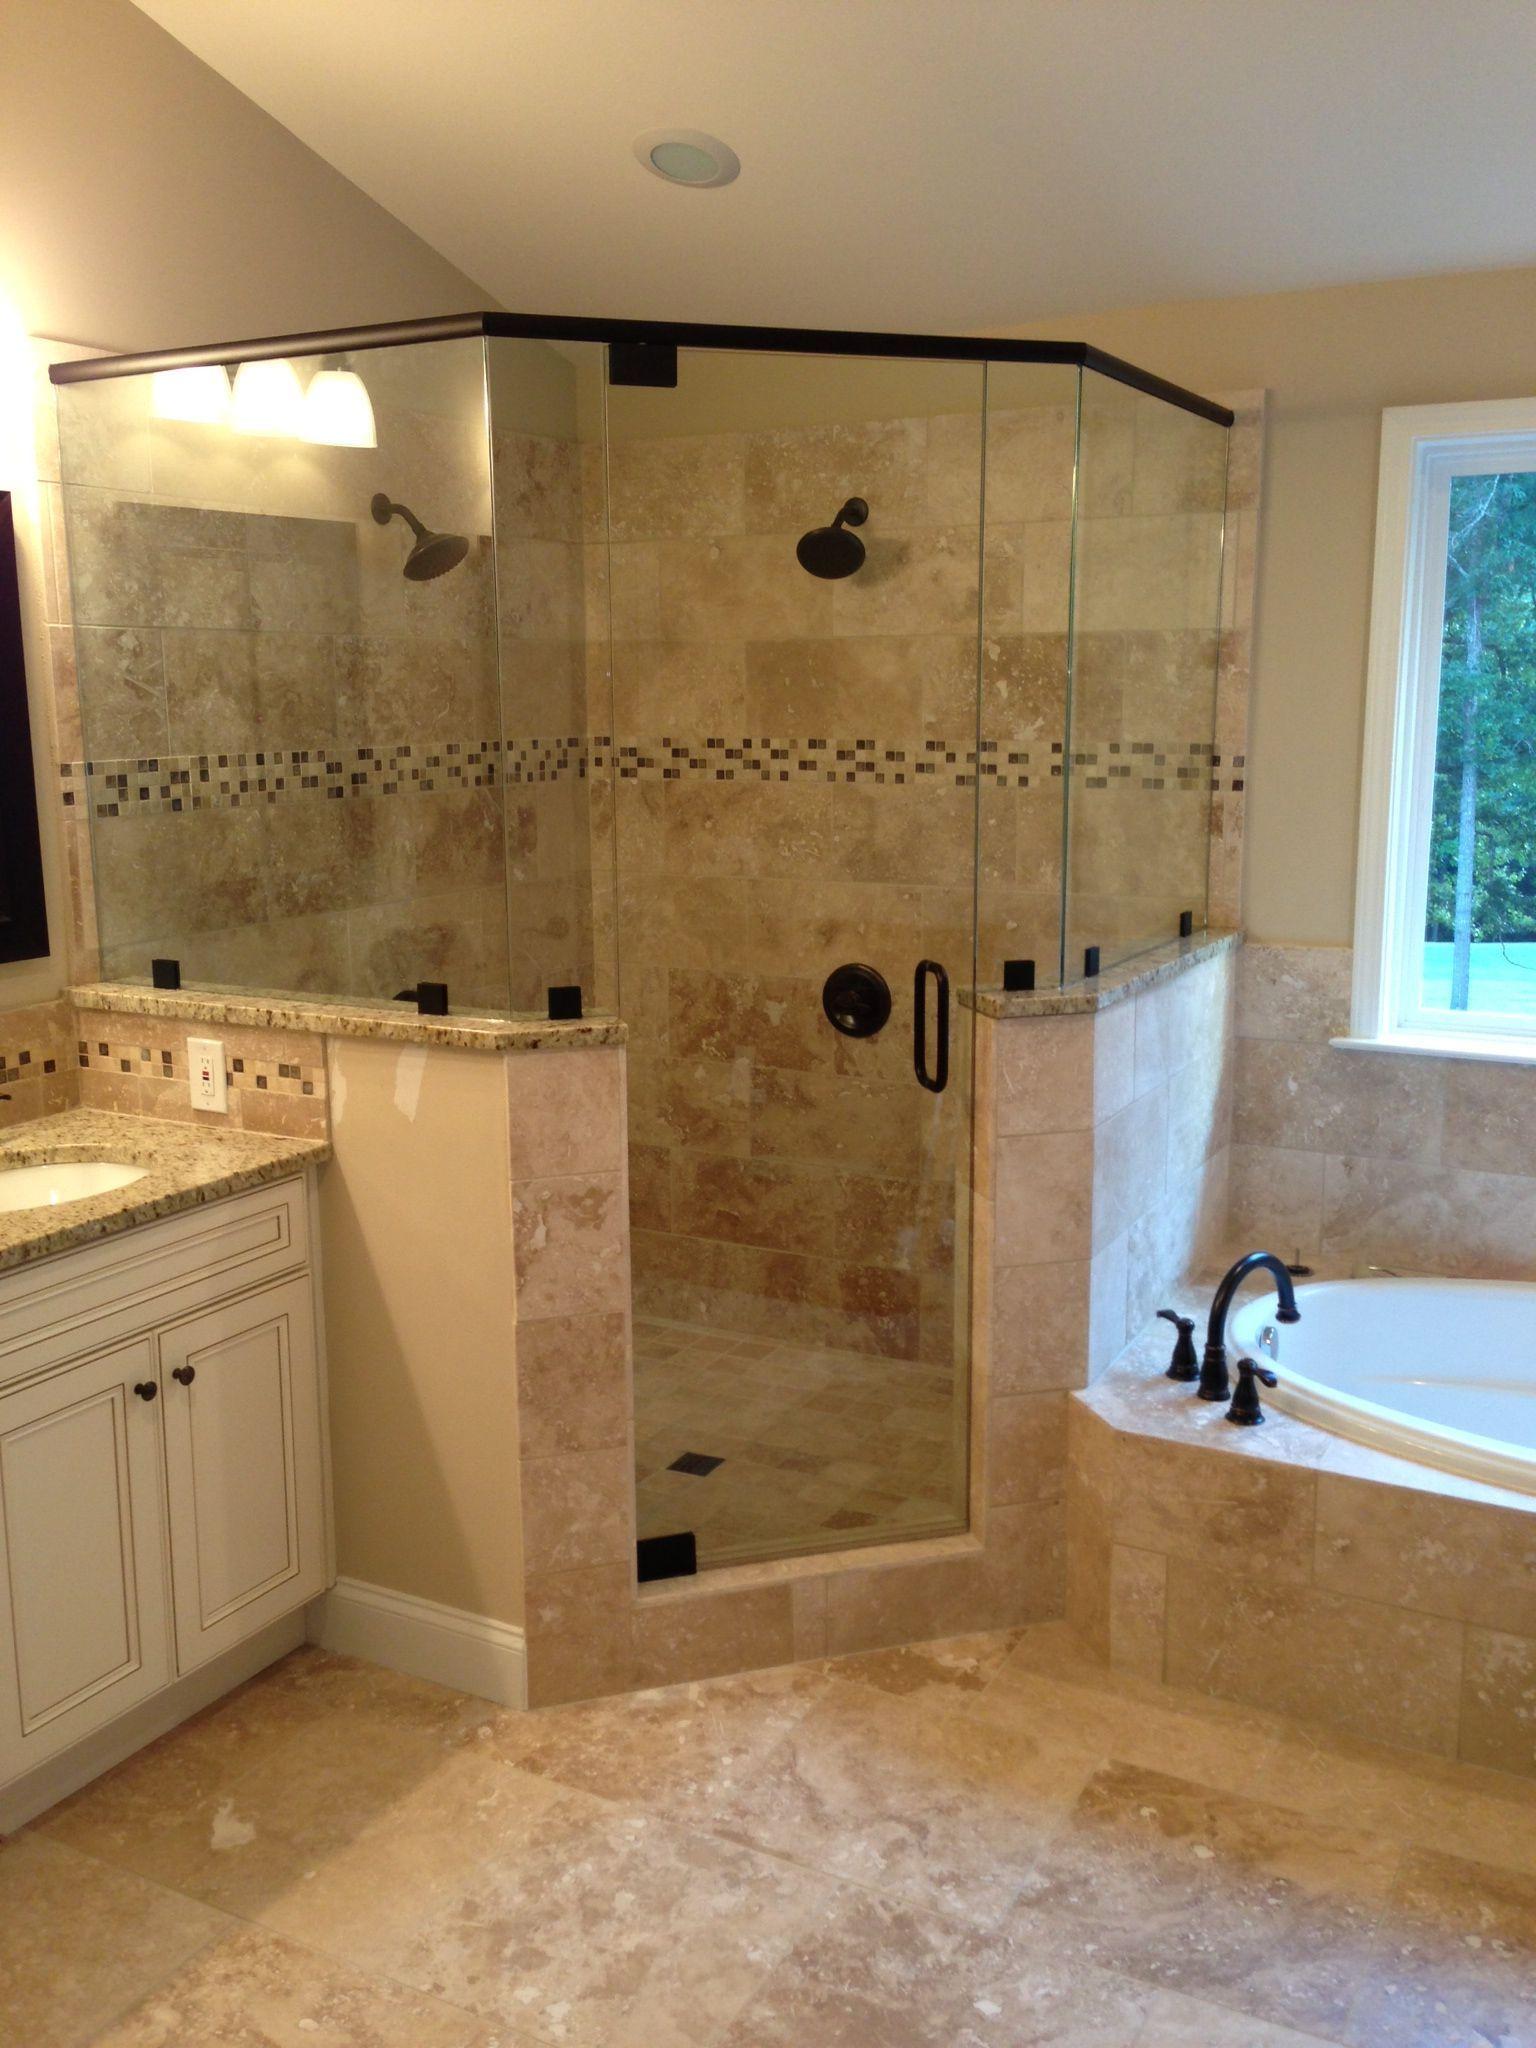 Image Result For Corner Tub Connected To Tiled Shower Master